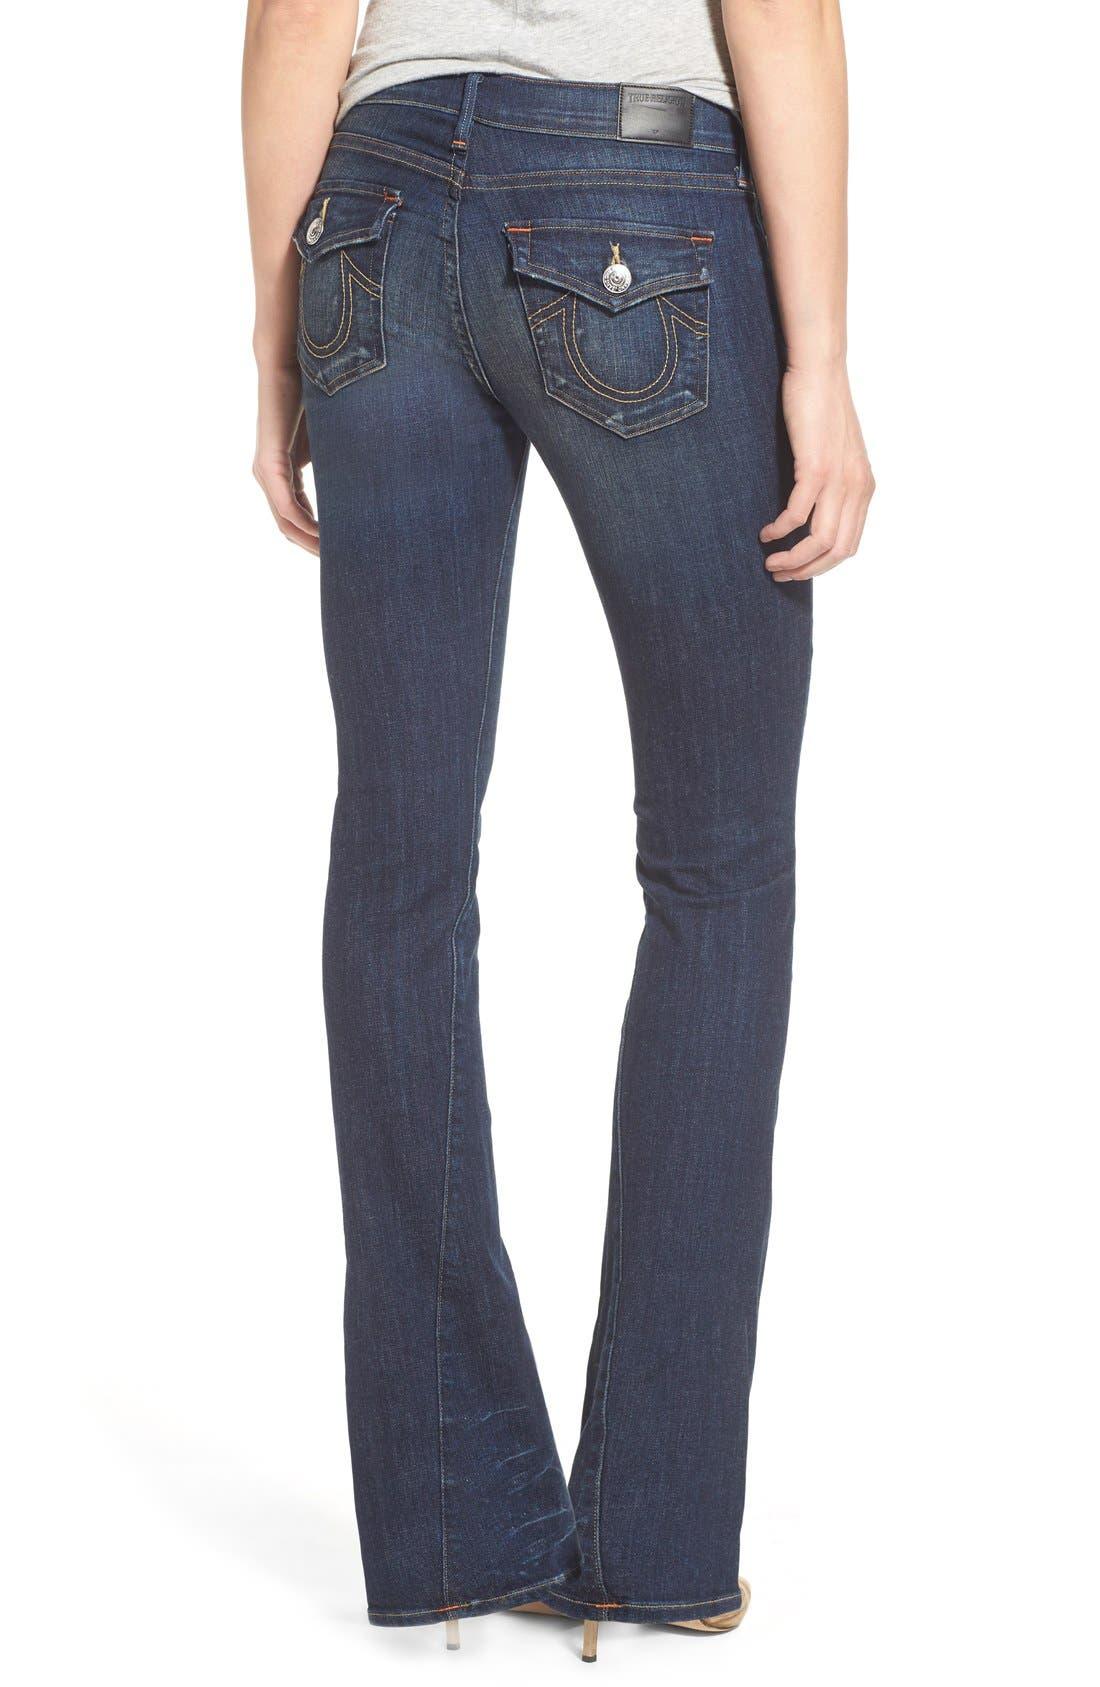 Alternate Image 2  - True Religion Brand Jeans 'Becca' Twisted Seam Bootcut Jeans (Boyfriend Wash)